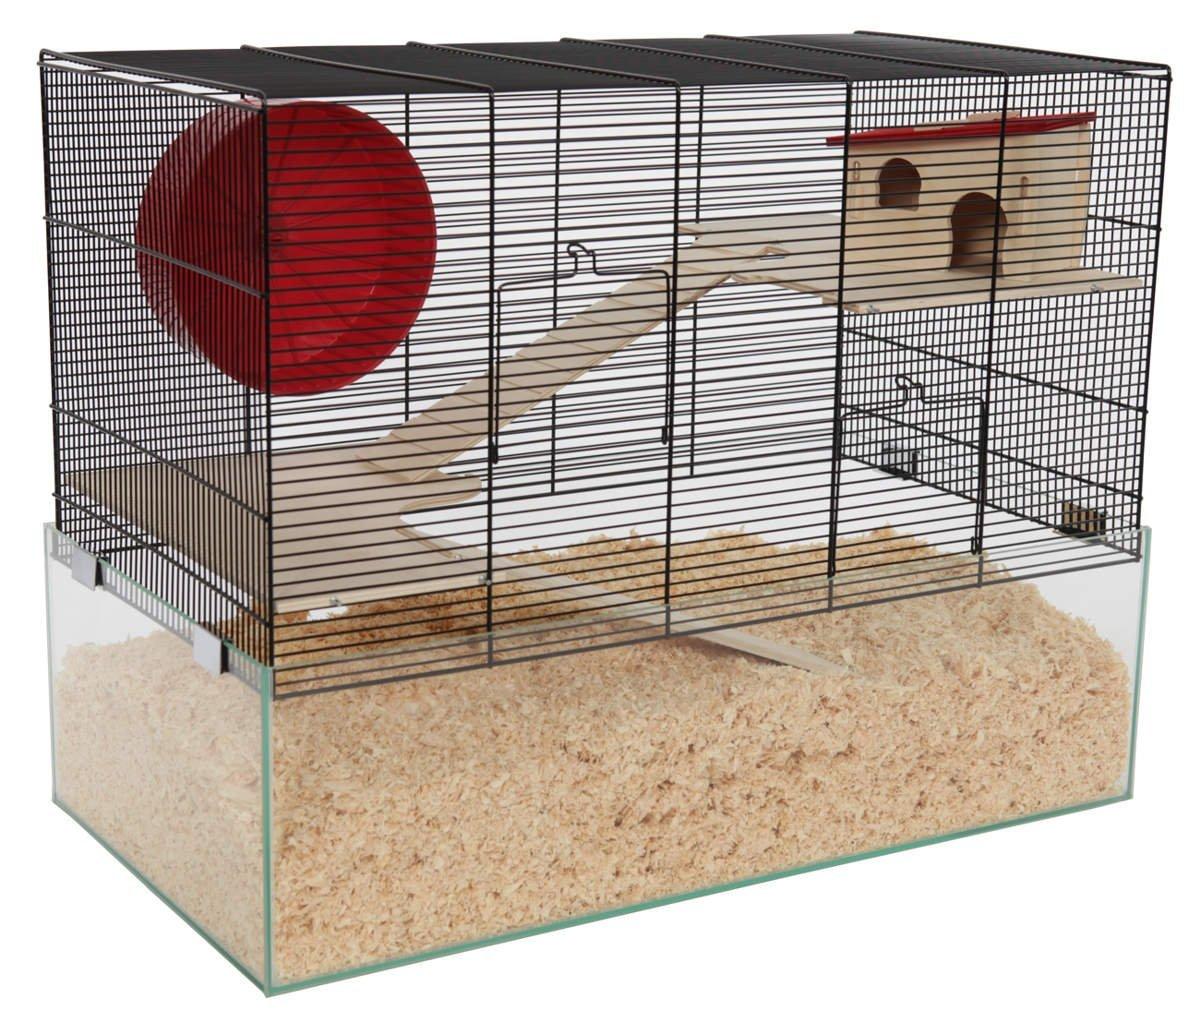 Ratten käfig